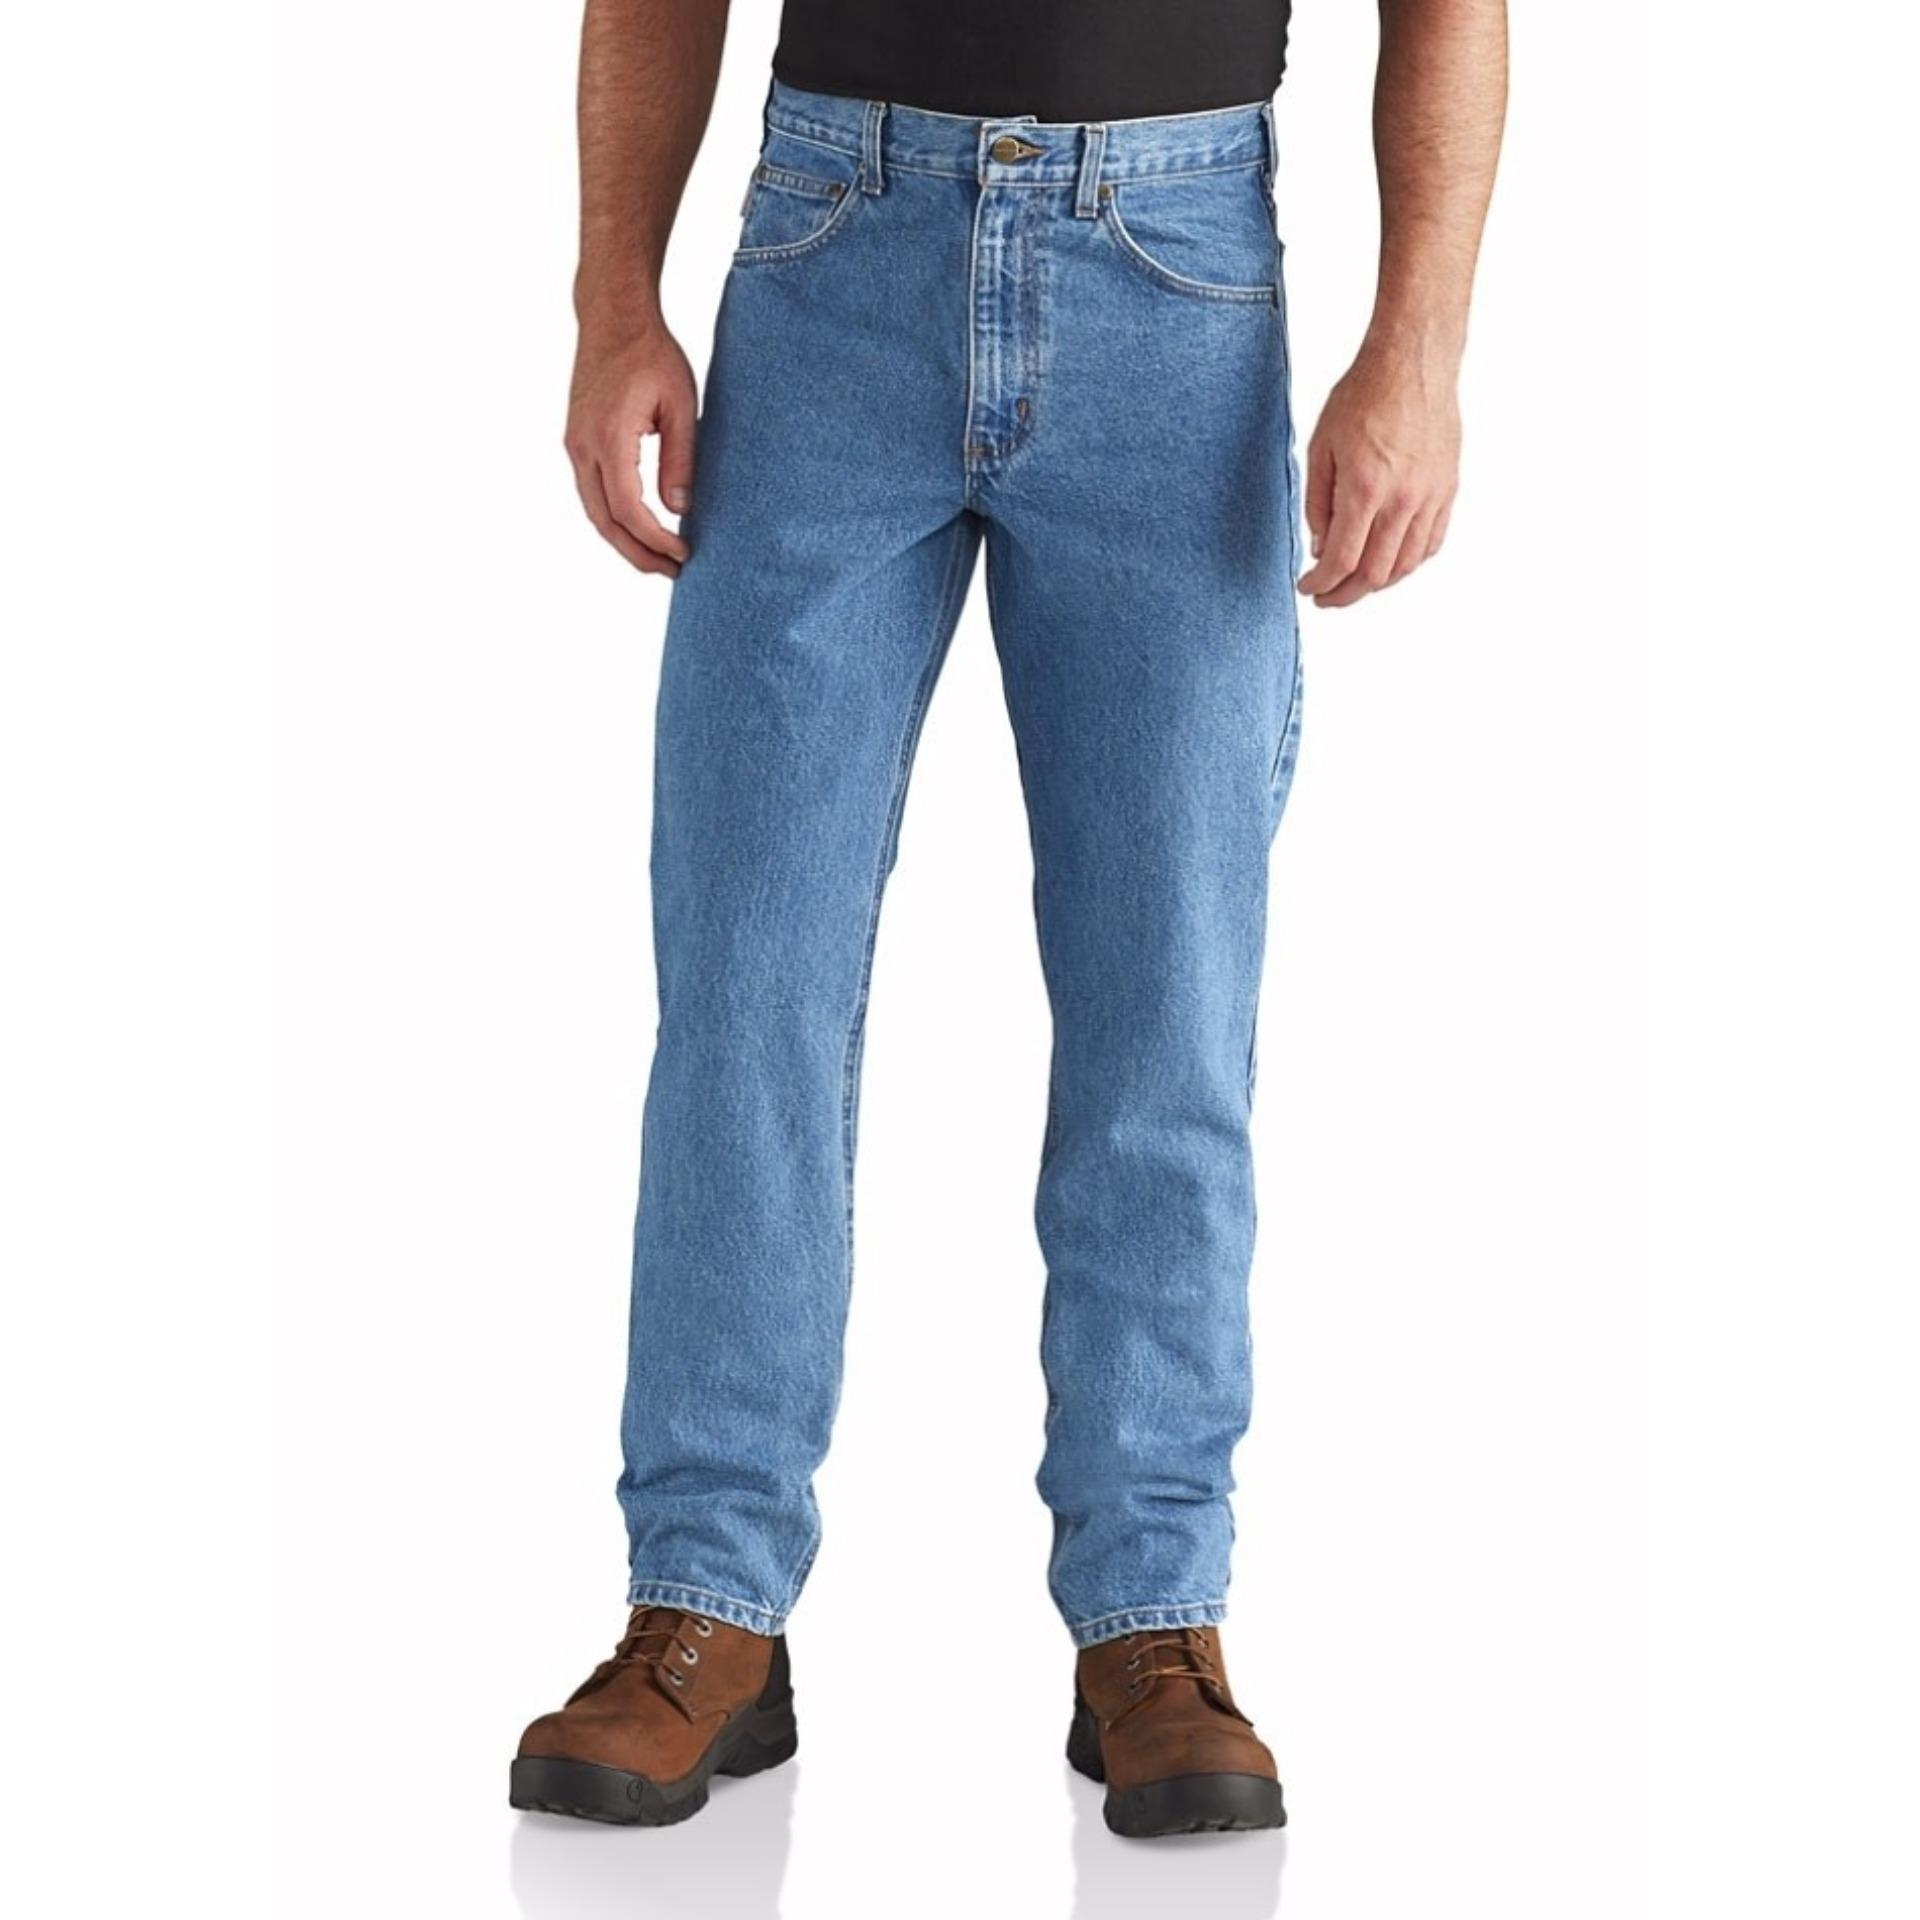 Jual Texan Celana Jeans Standard Pria Warna Biru Muda Light Blue Celana Jeans Big Size 33 34 35 36 37 38 Texan Ori